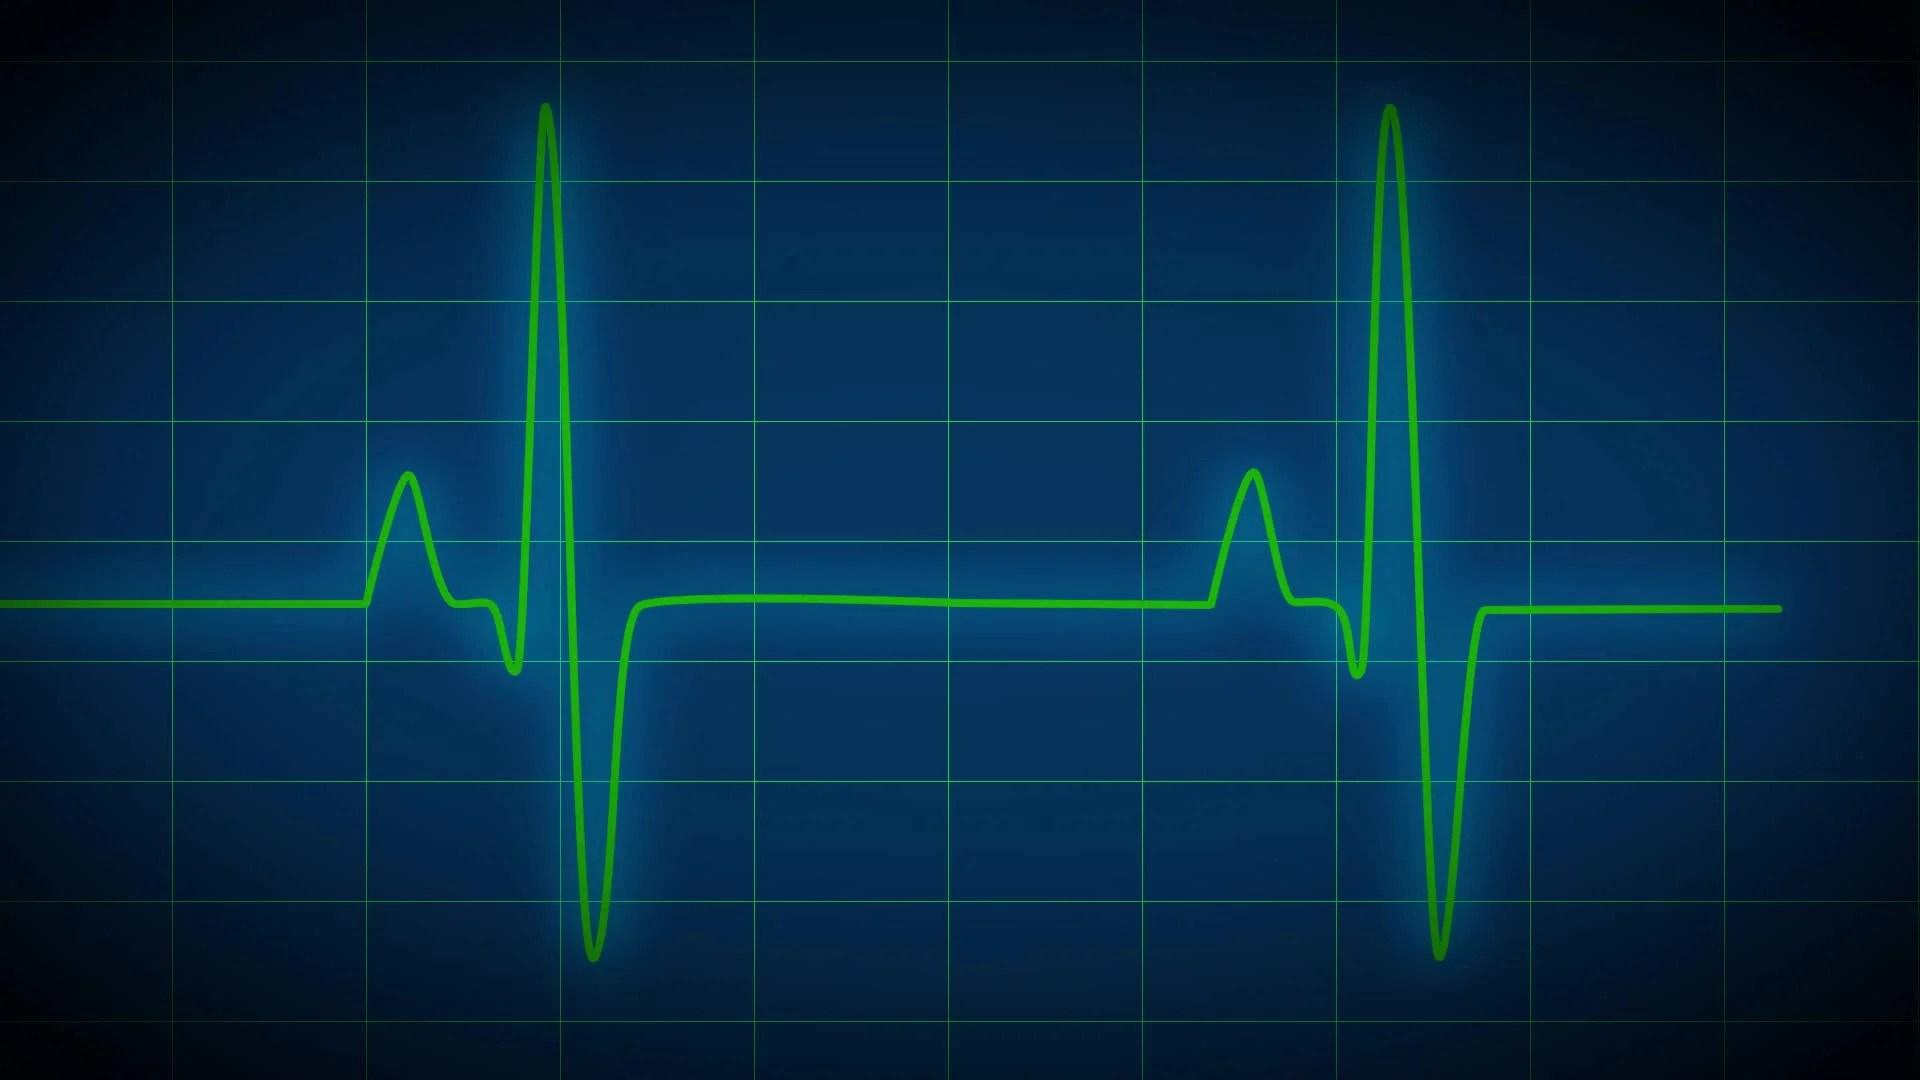 Animated Butterfly Wallpaper Ekg Heart Monitor Blue Hd Amp 4k Stock Footage 12418933